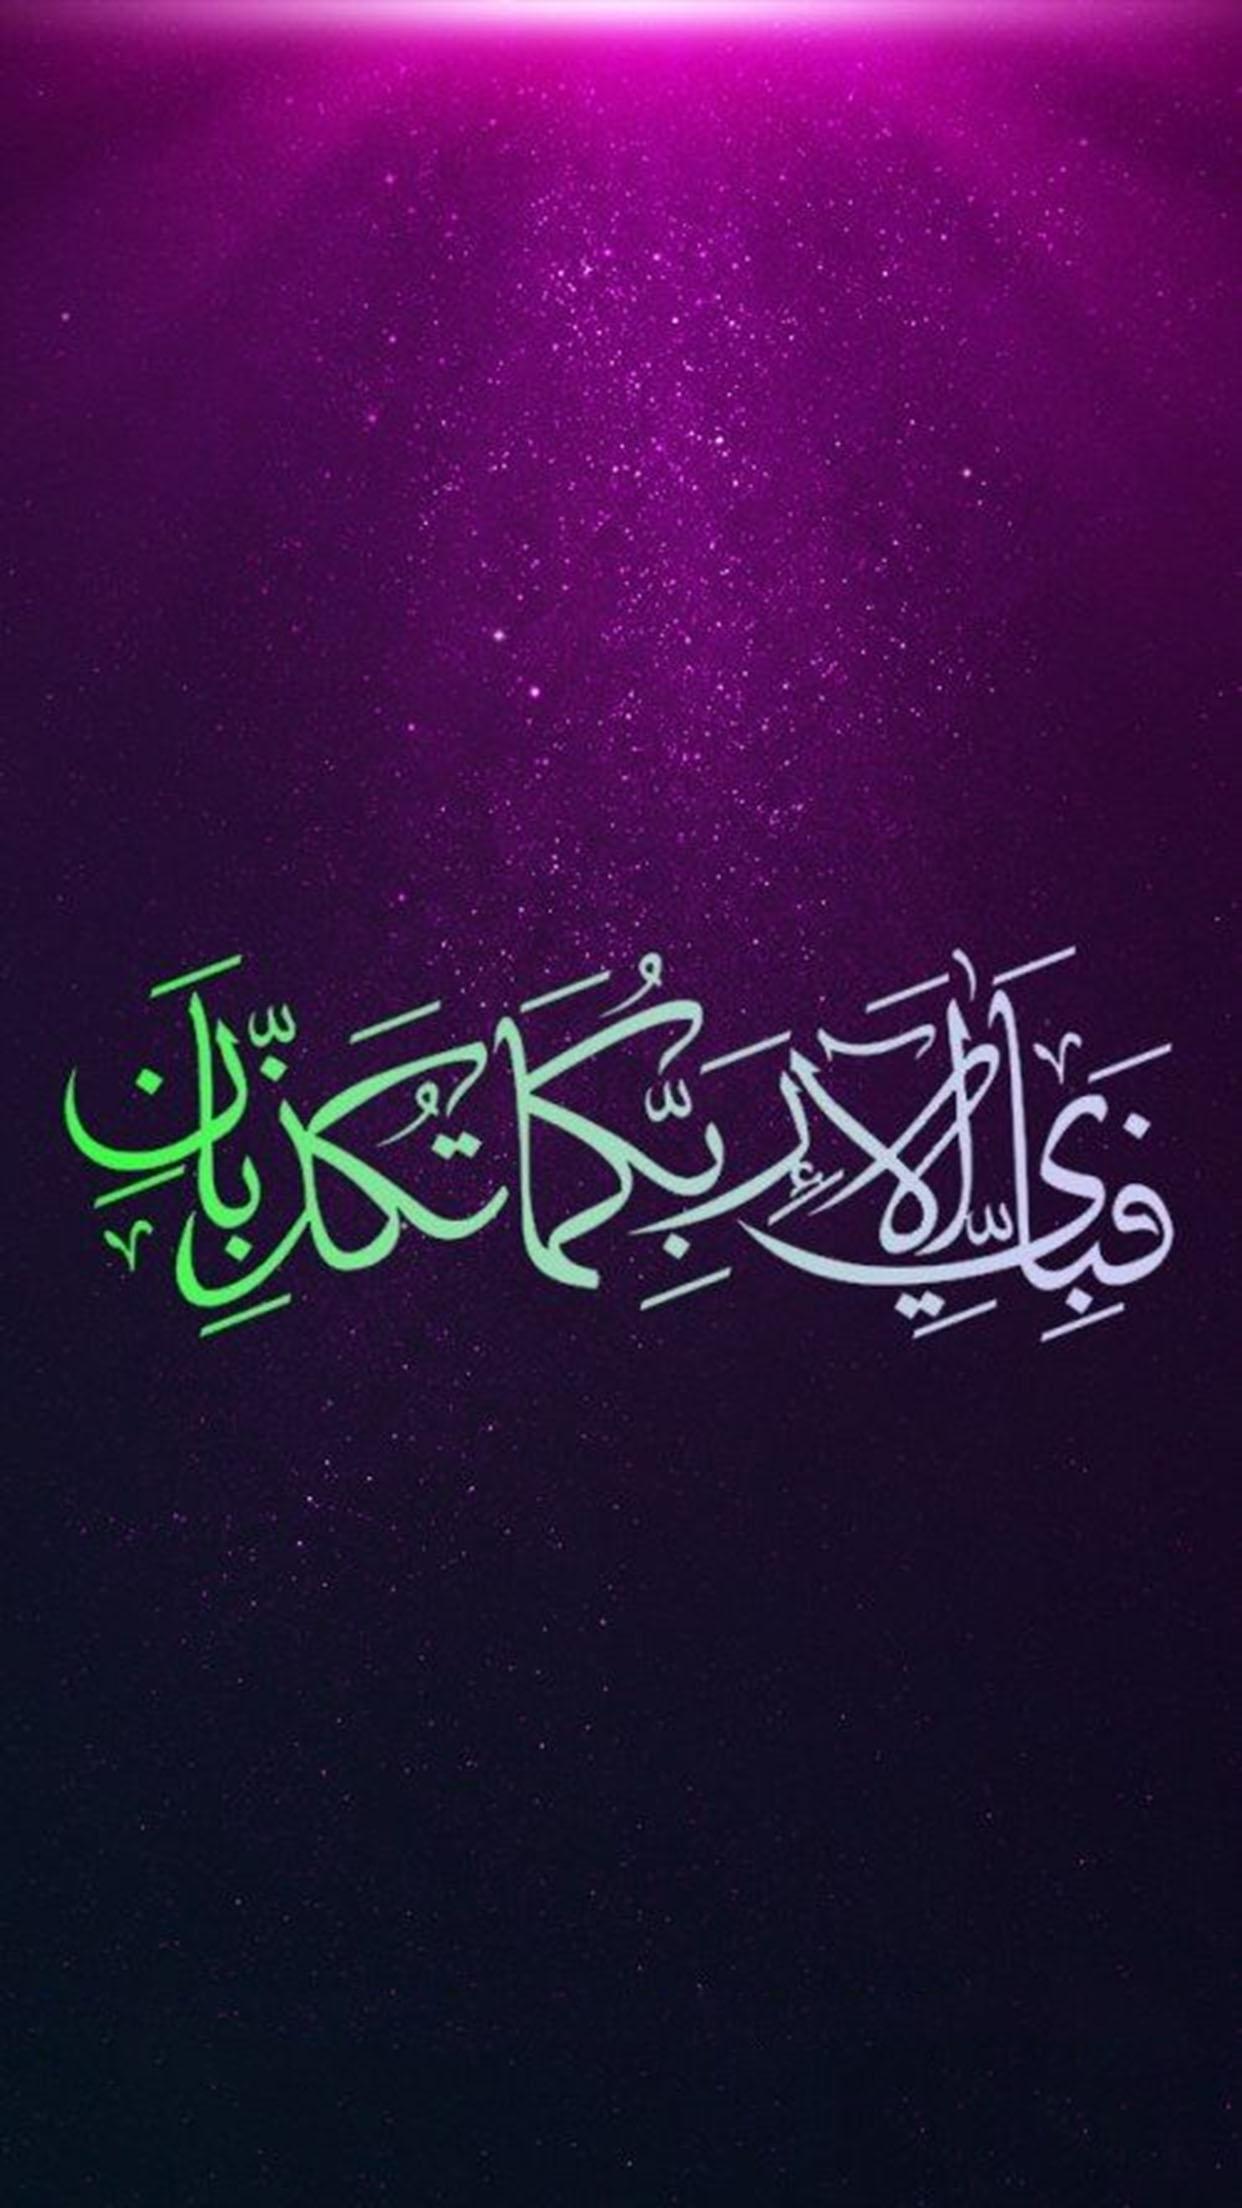 Картинки ислам на айфон